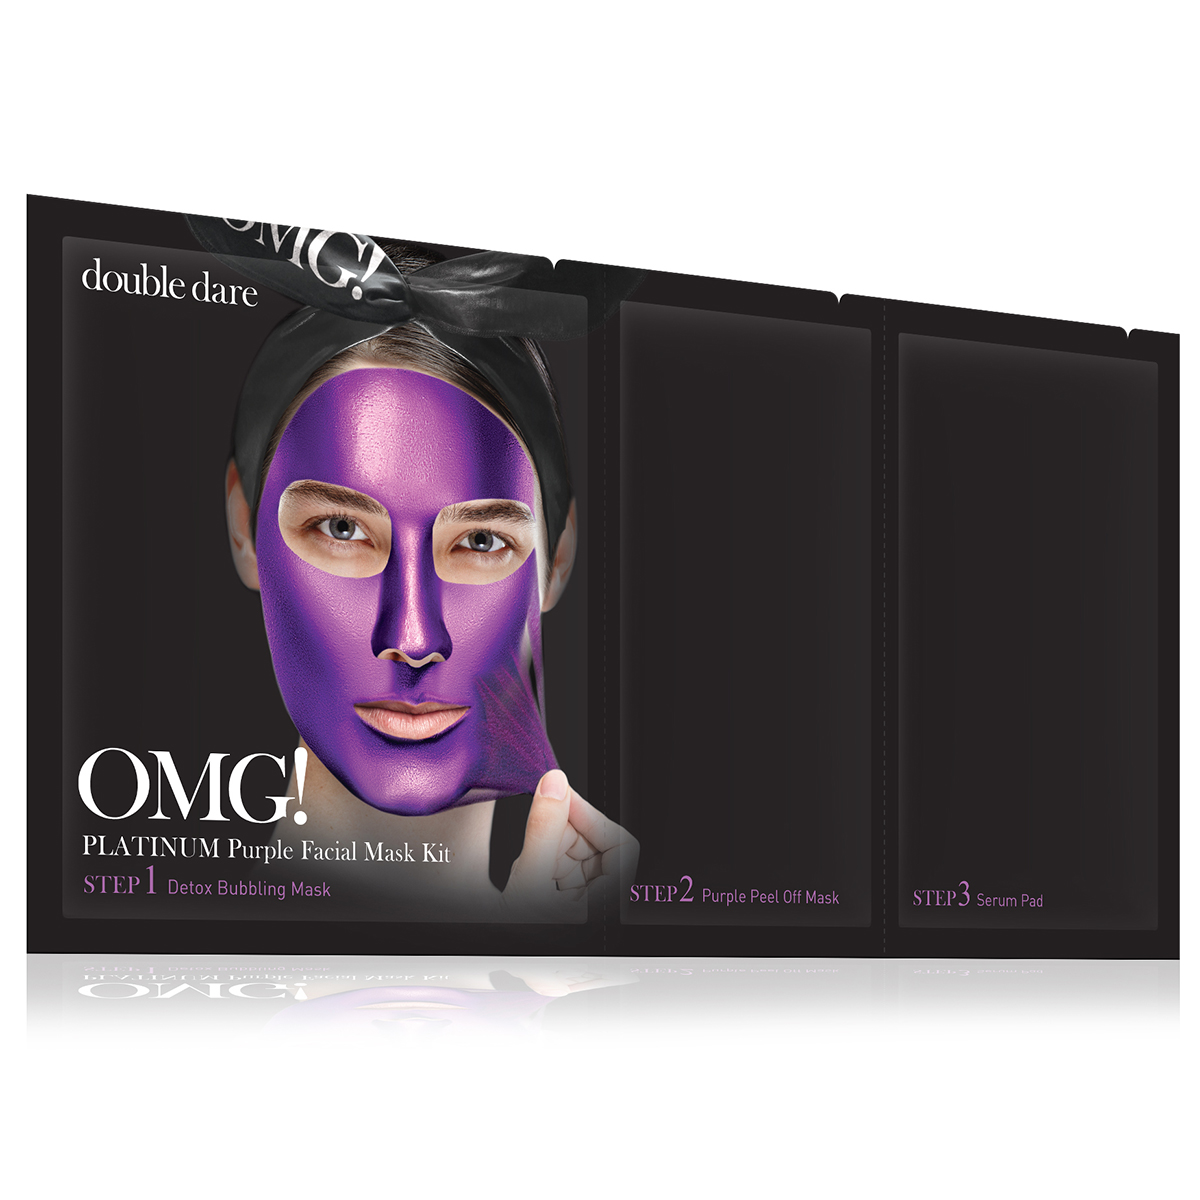 Double Dare OMG! Platinum Purple Facial Mask Kit Маска трехкомпонентная для ухода за кожей лица фиолетовая double dare omg маска трехкомпонентная для восстановления волос 3in1 kit hair repair system